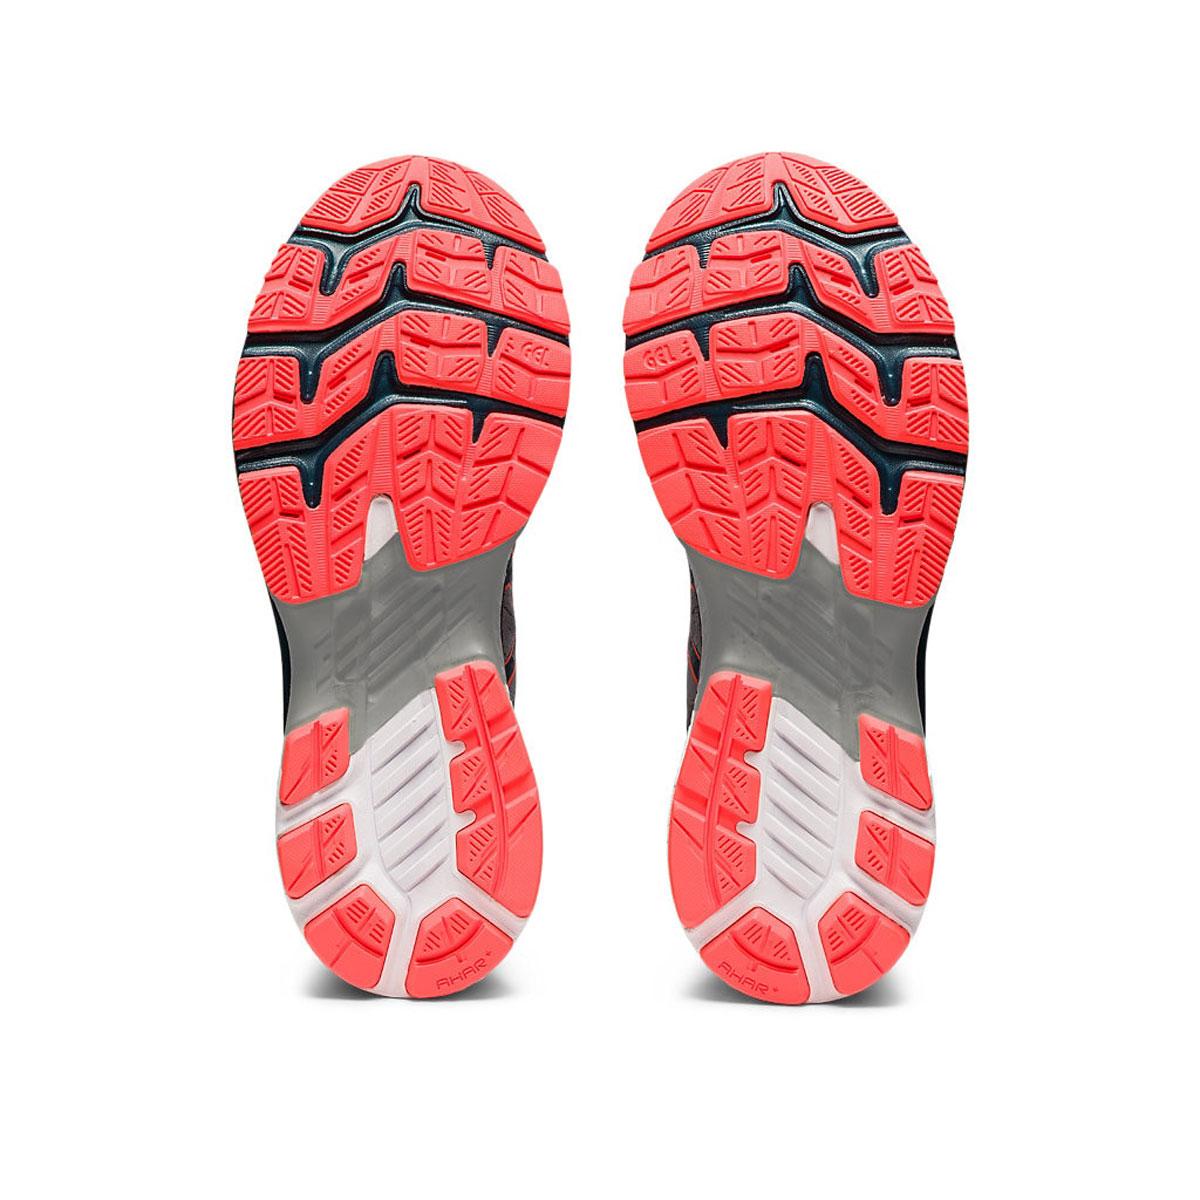 Men's Asics GEL-Kayano 27 Running Shoe - Color: Sheet Rock/Magn (Regular Width) - Size: 6, Sheet Rock/Magnetic Blue, large, image 7